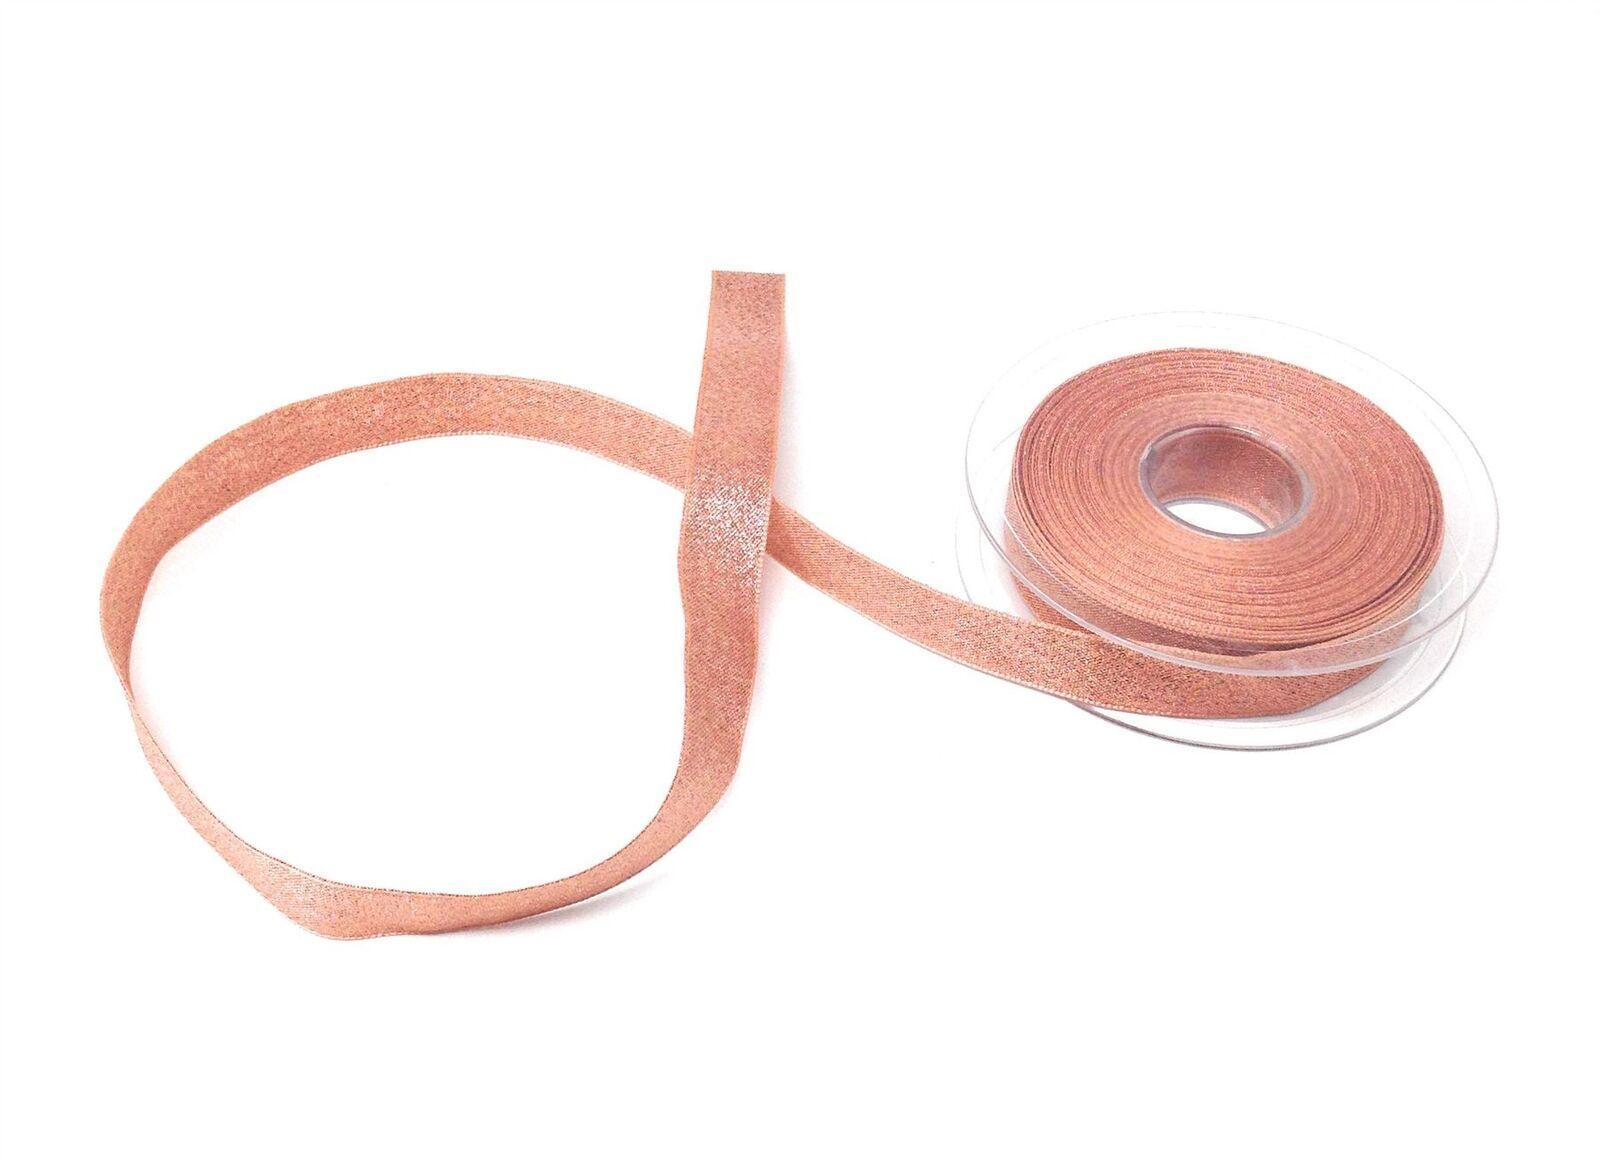 Gingham Check Cerise Pink White Ribbon 10mm *4 Lengths*